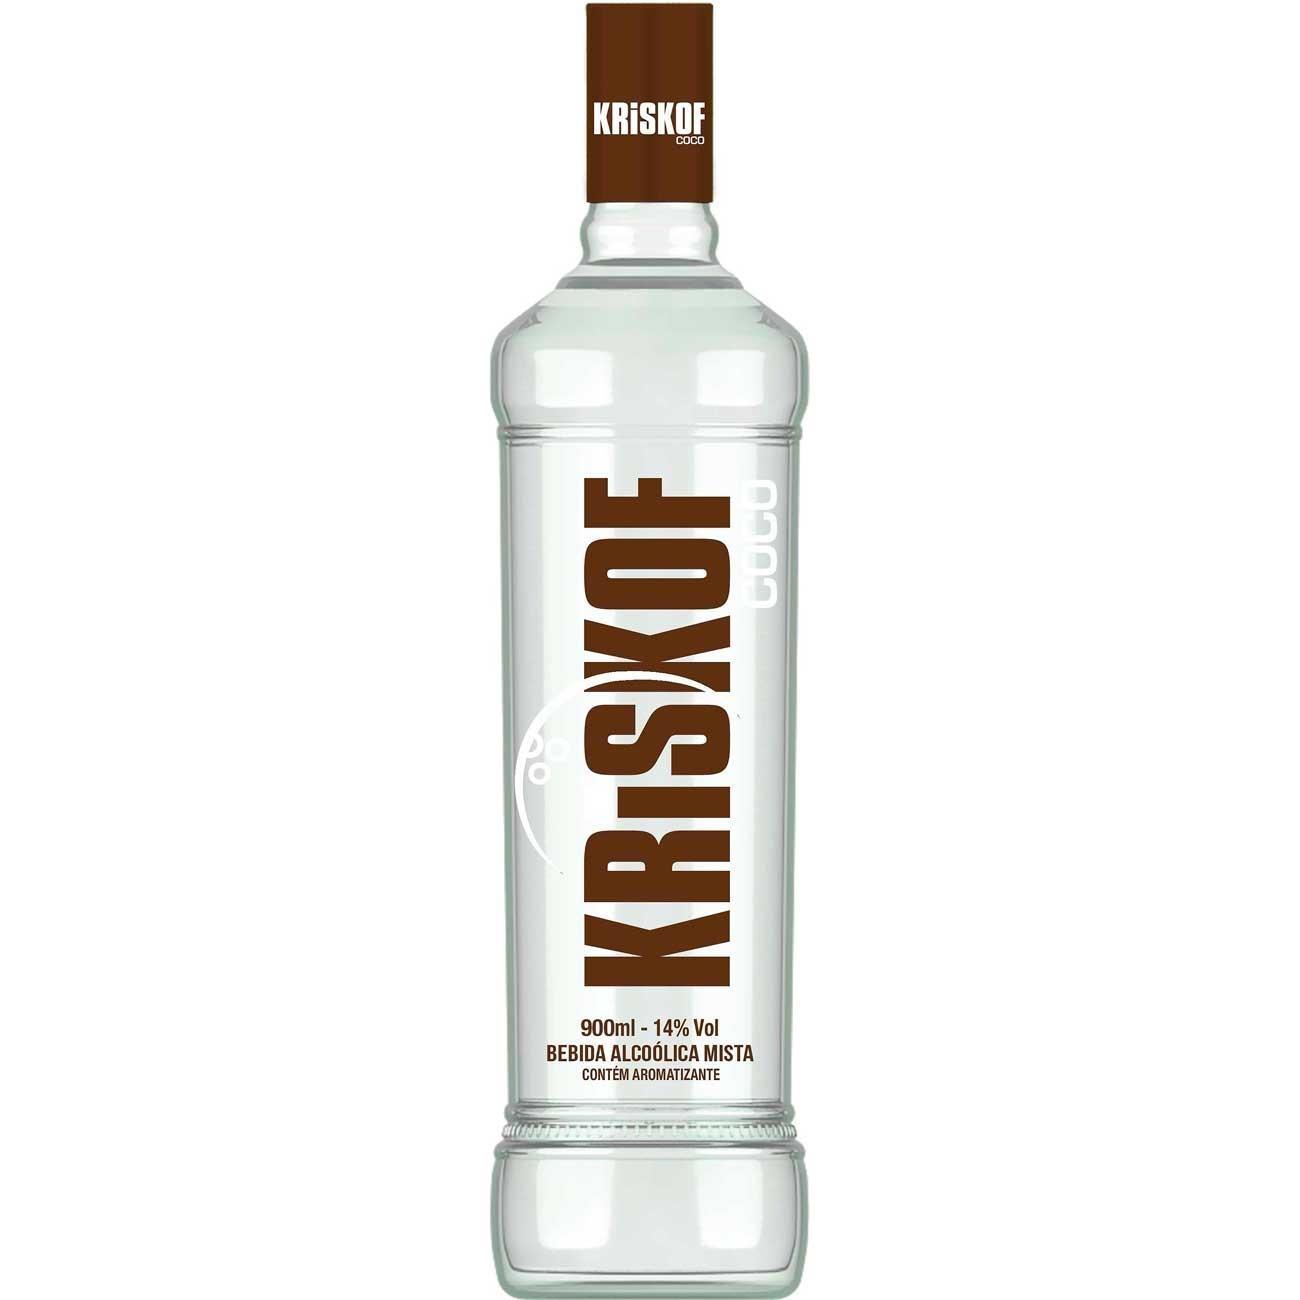 Vodka Kriskof Coco 900ml | Caixa com 6 unidades